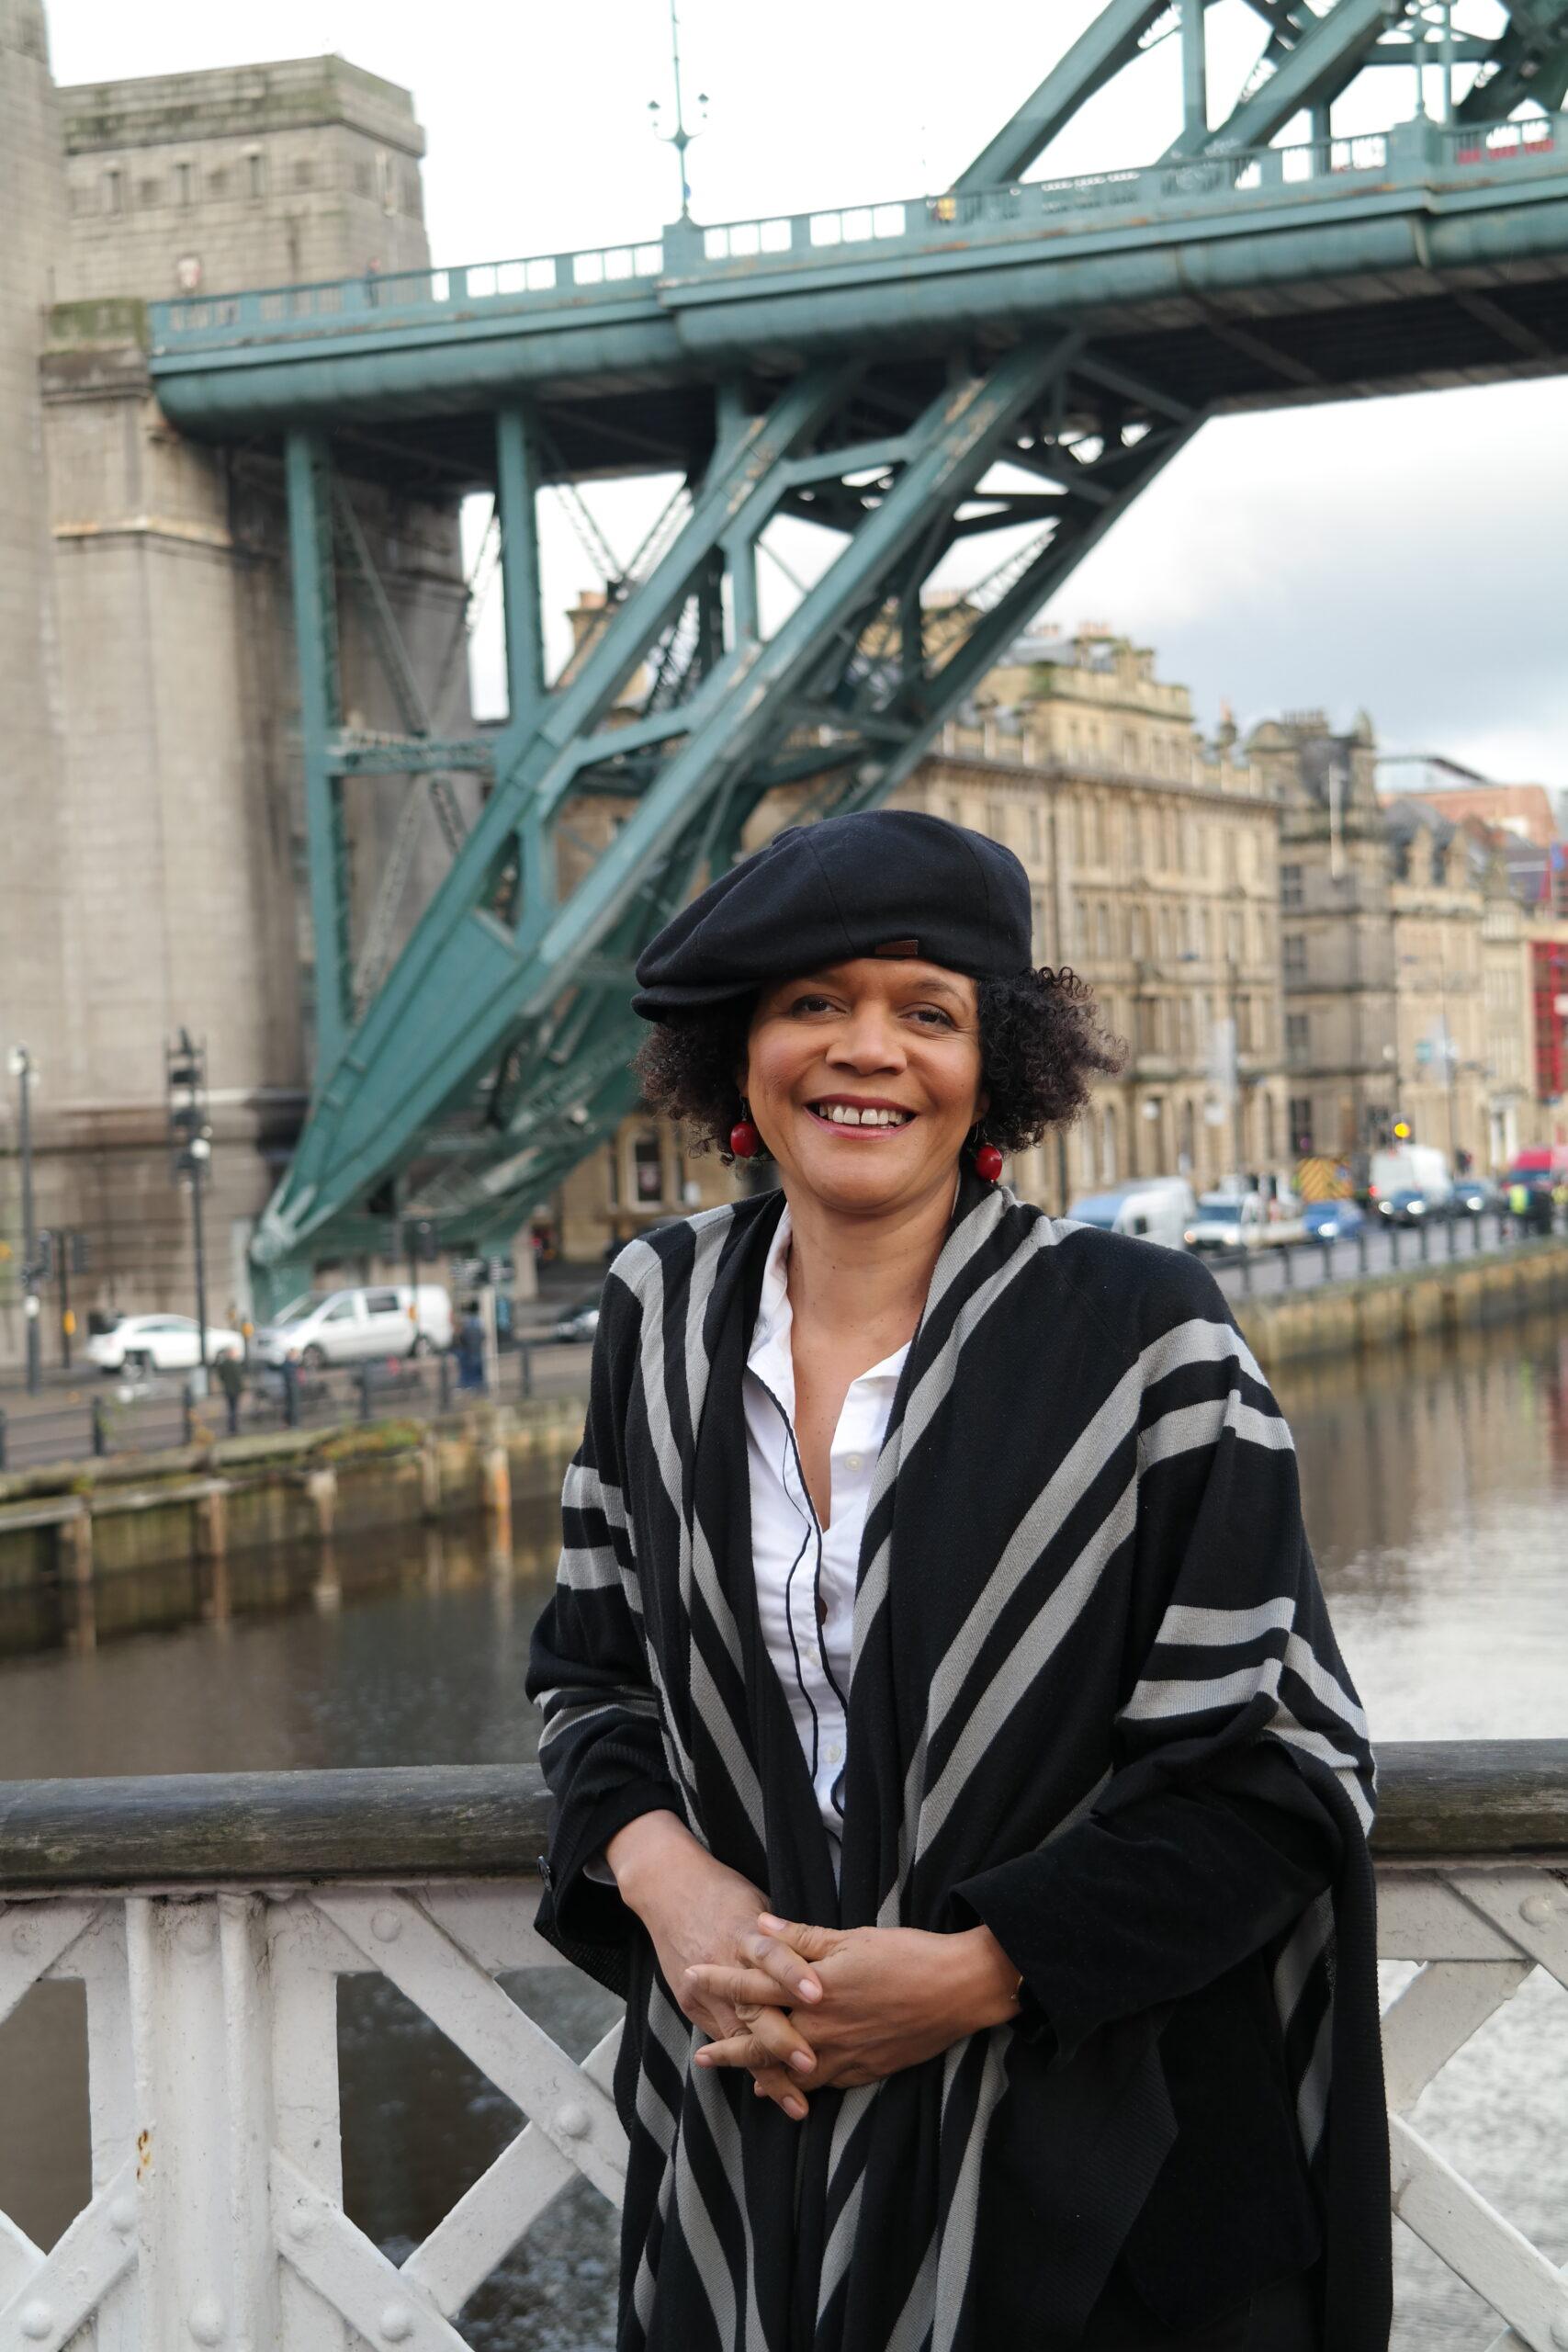 Celebrating 100 years of the Tyne Bridge